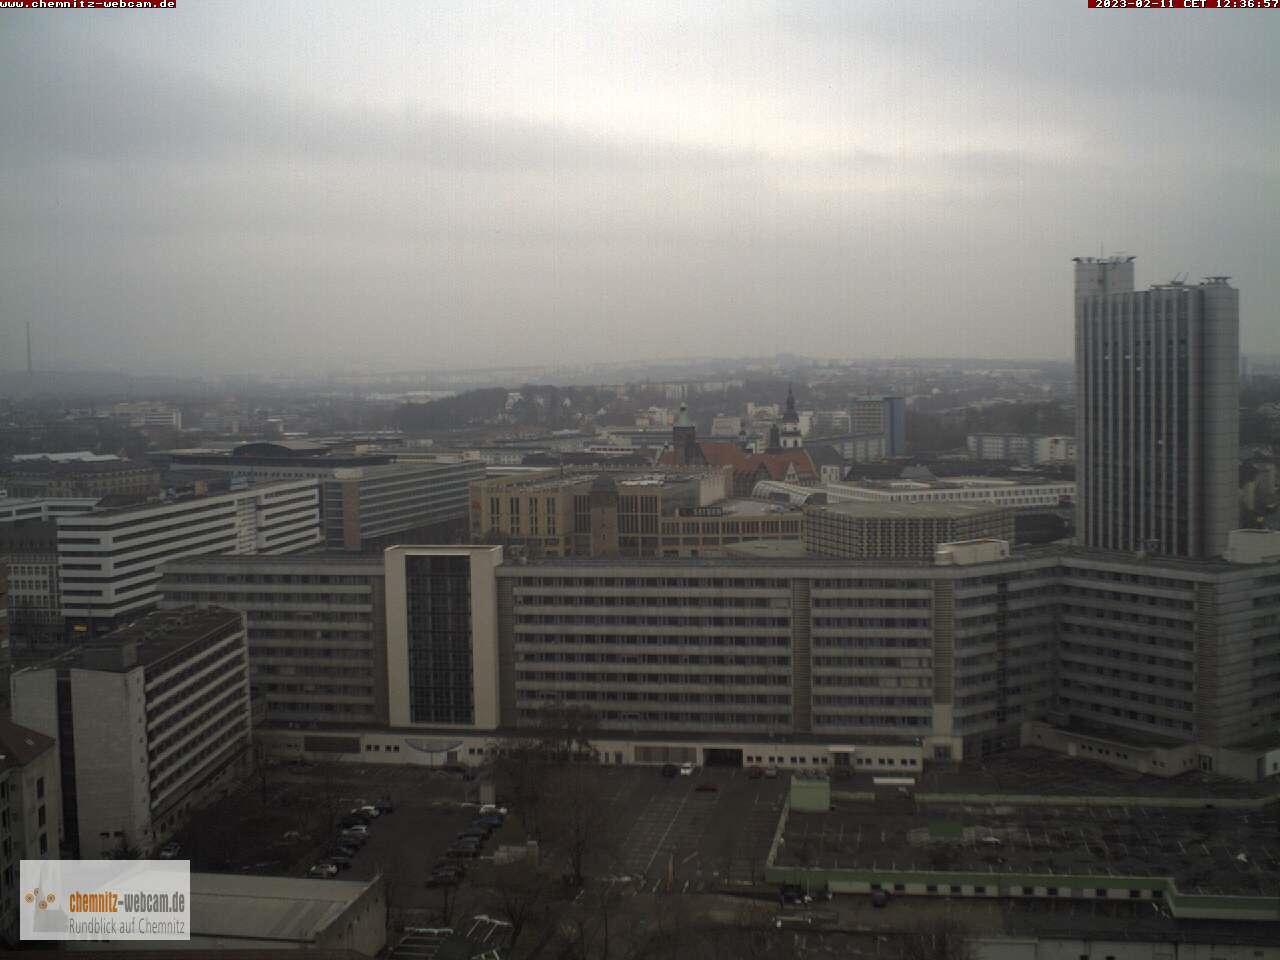 Chemnitz Webcam